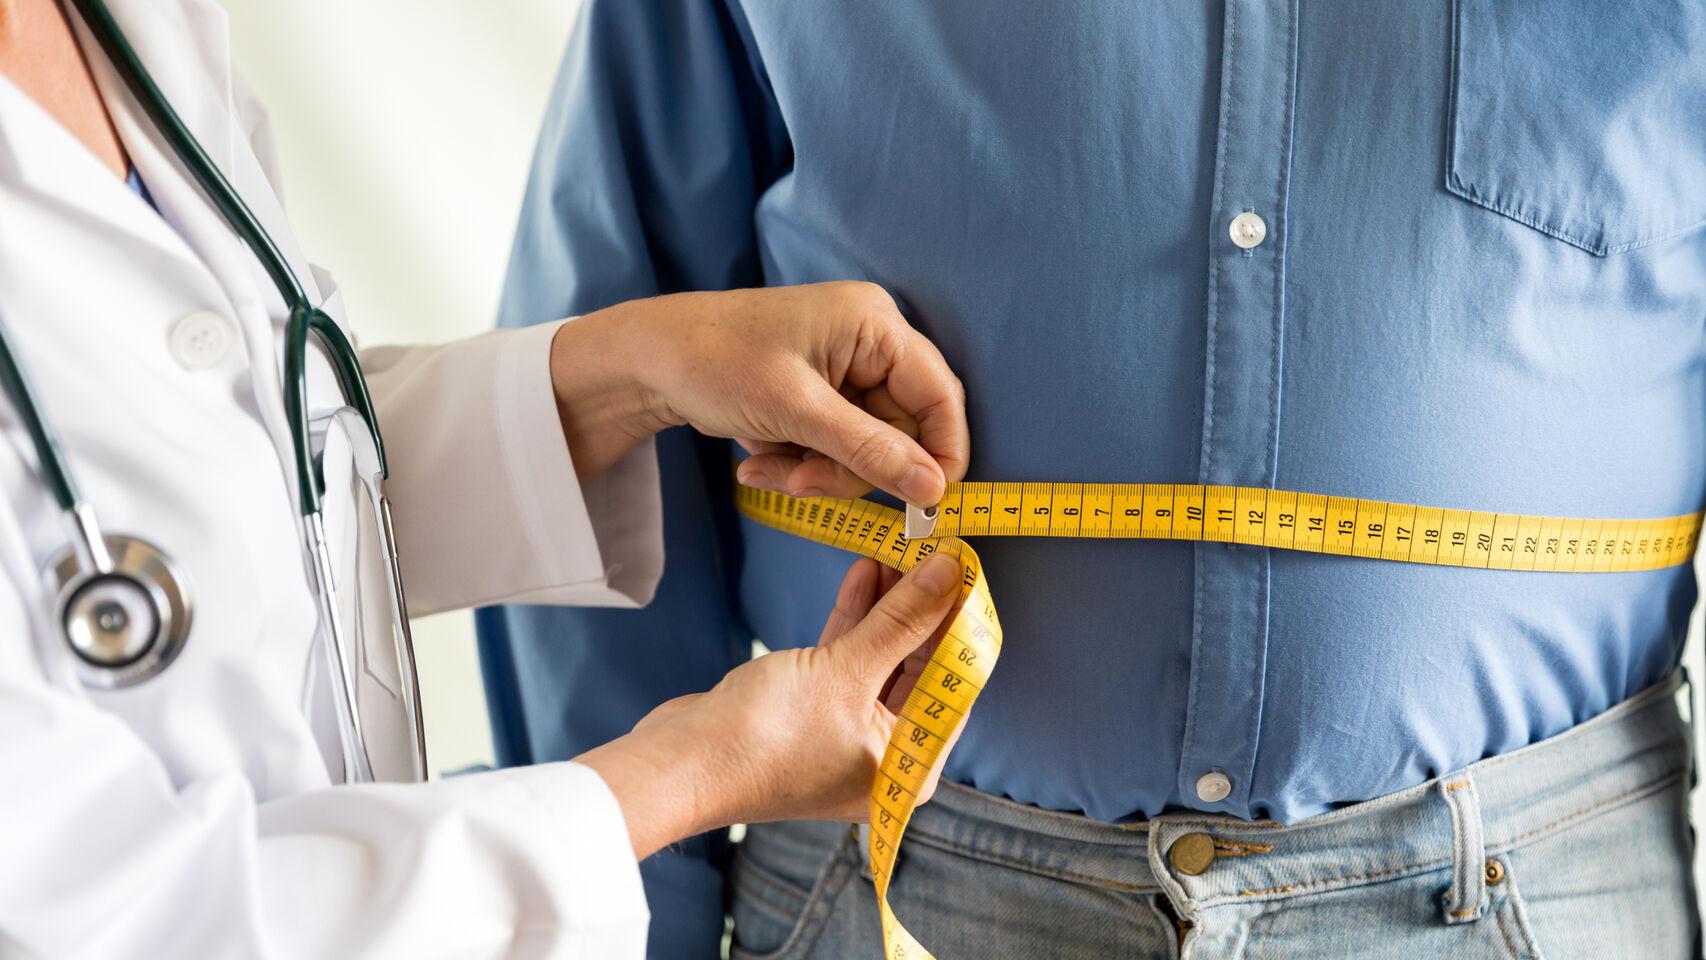 La obesidad, cerca de convertirse en la epidemia del siglo XXI